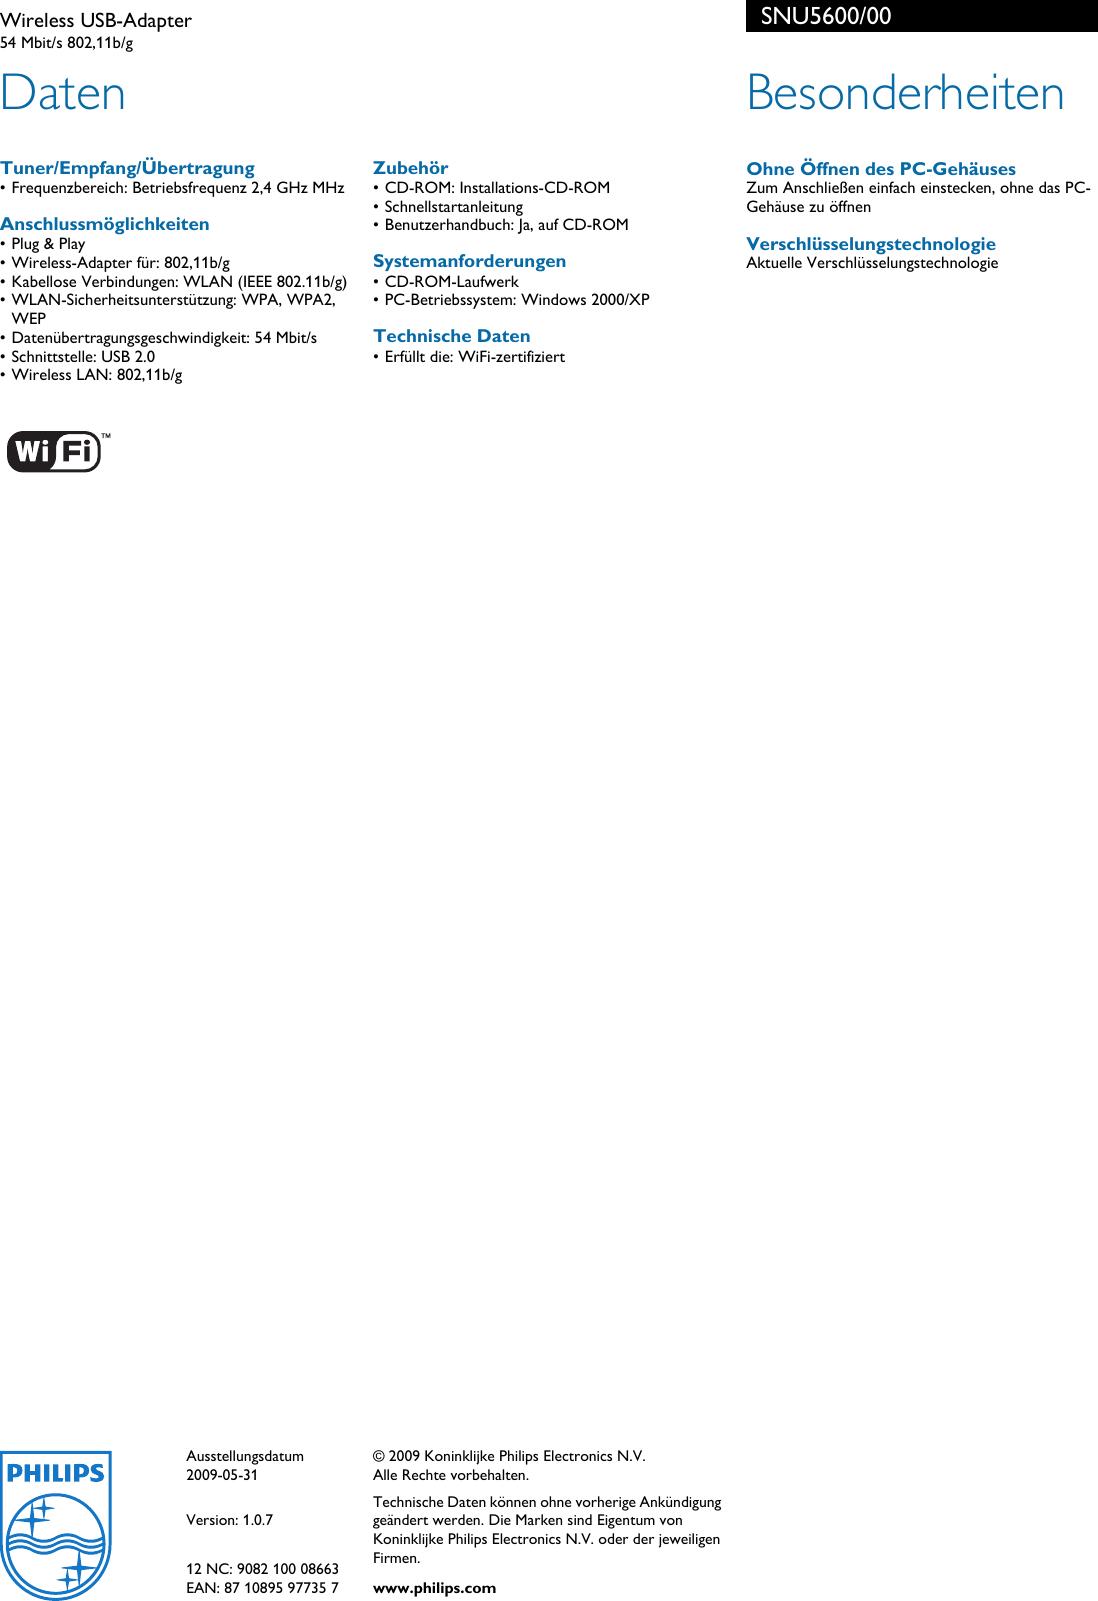 ADAPTER SNU5600 DRIVER FOR WINDOWS MAC